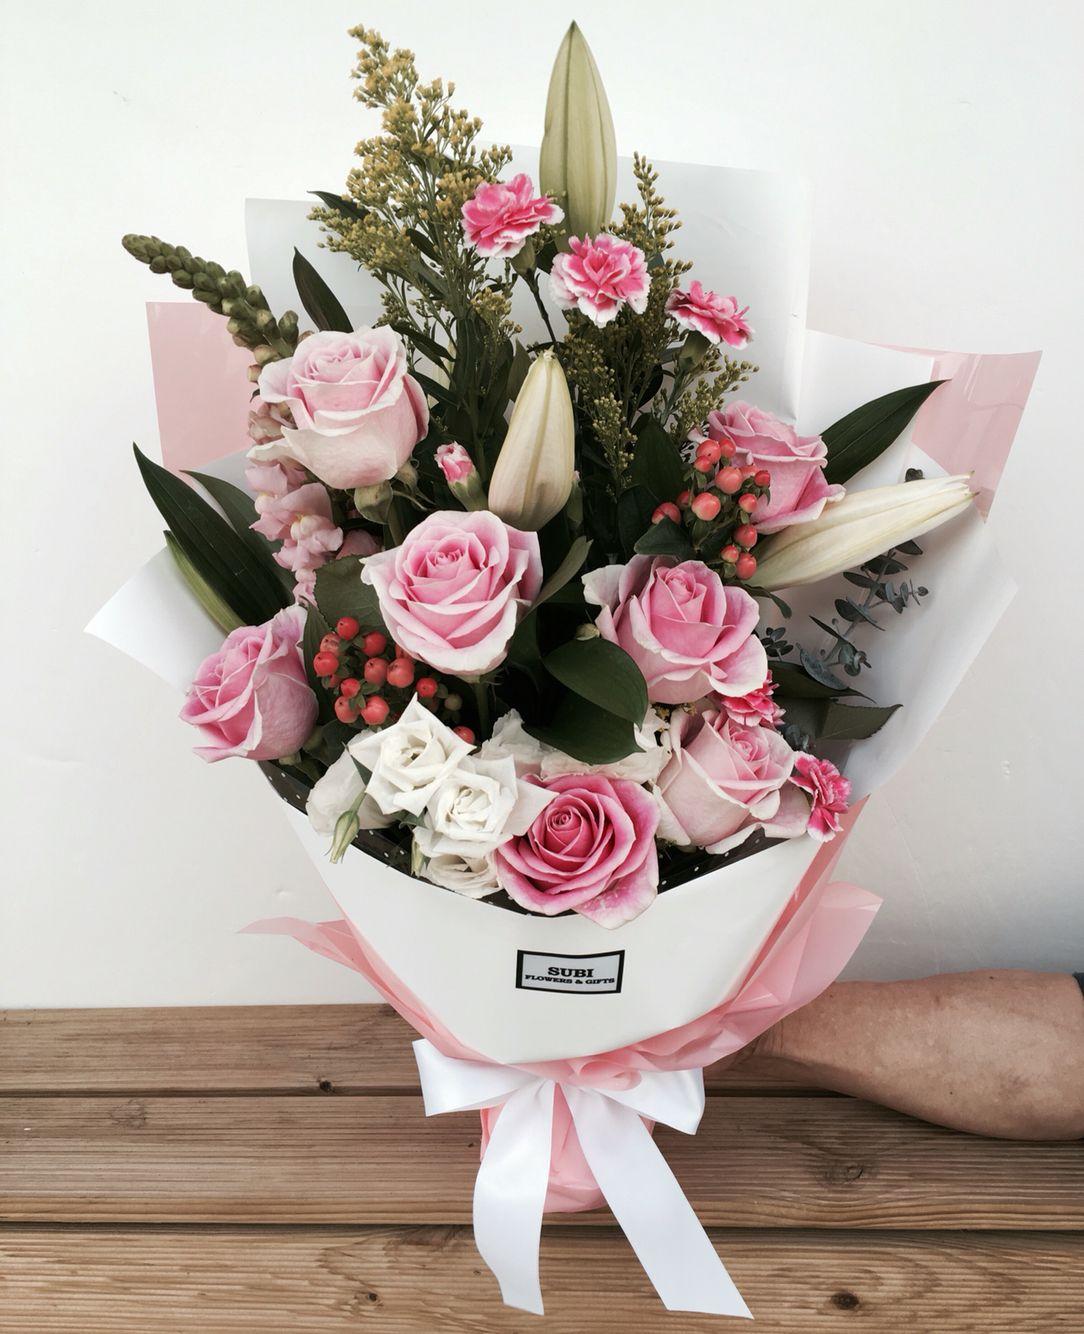 Pin by Роза on Донна Роза | Pinterest | Flowers, Flower and ...